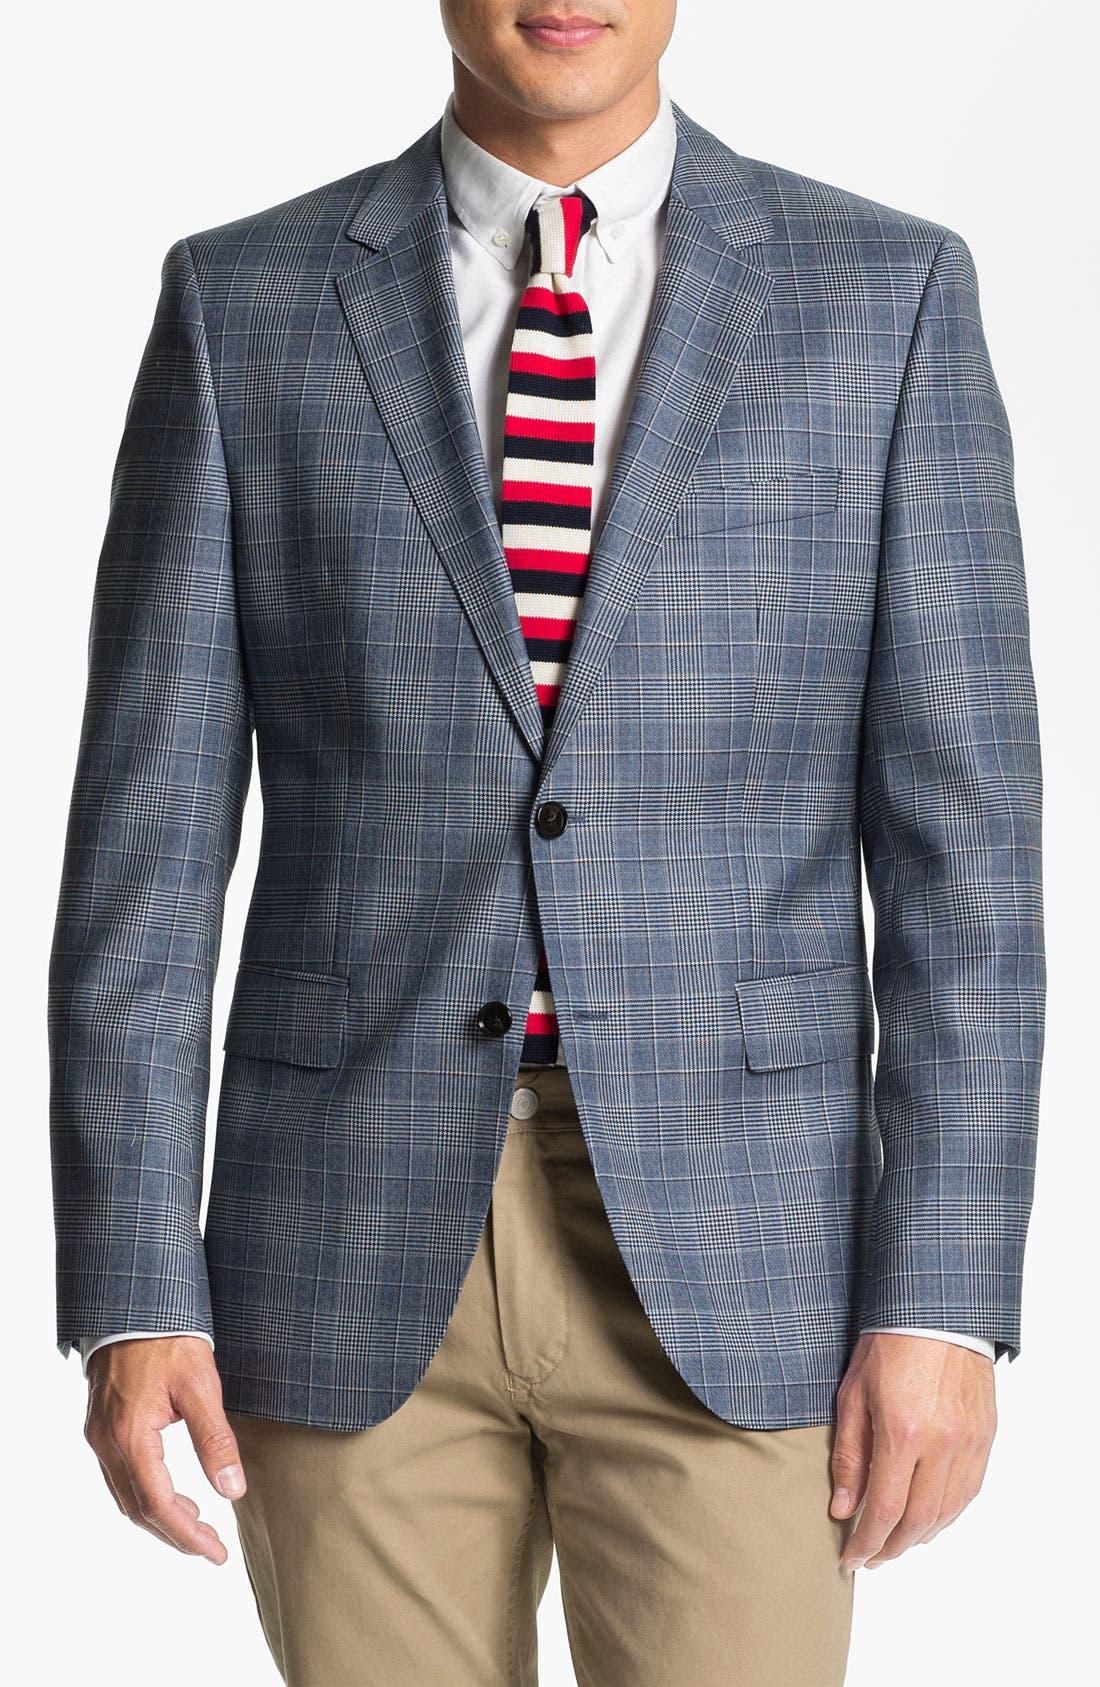 ZZDNUHUGO BOSS BOSS Black 'James' Trim Fit Plaid Sportcoat, Main, color, 460